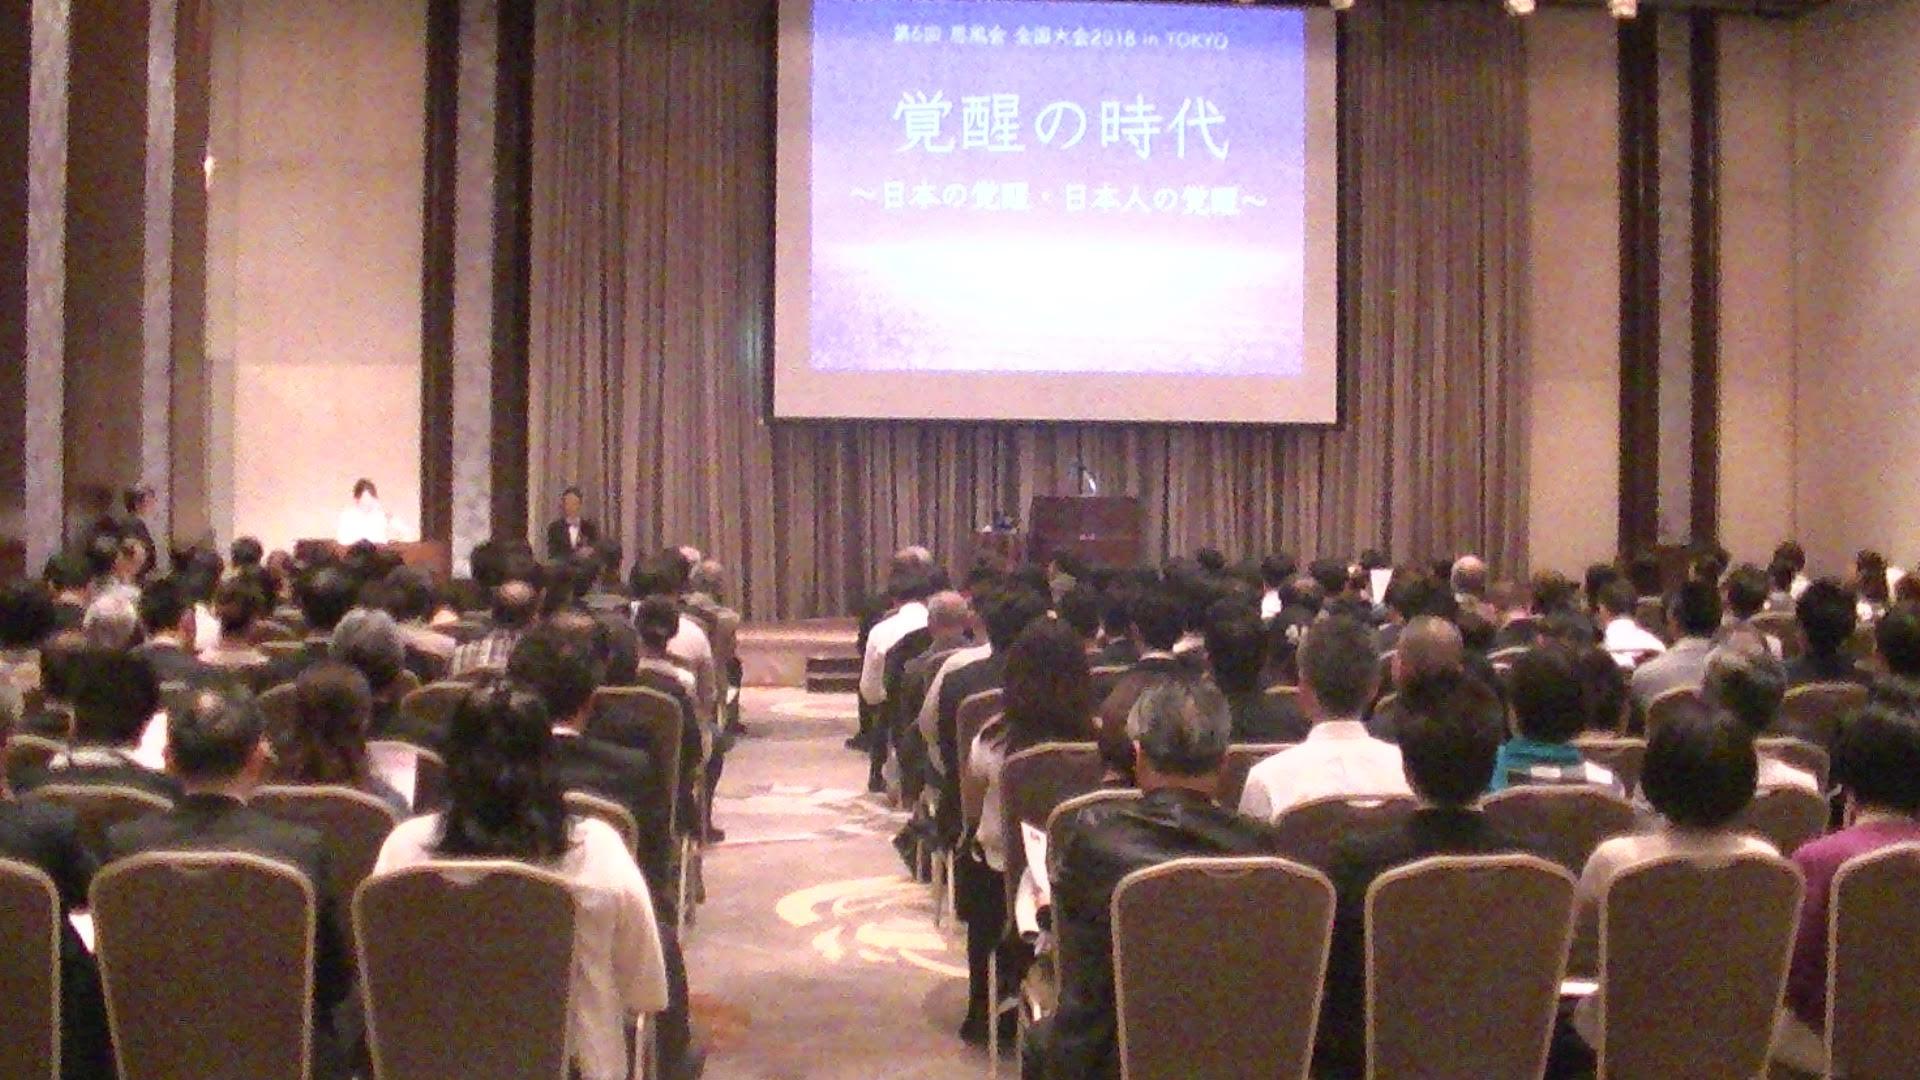 PIC 1622 1 - 思風会全国大会in広島